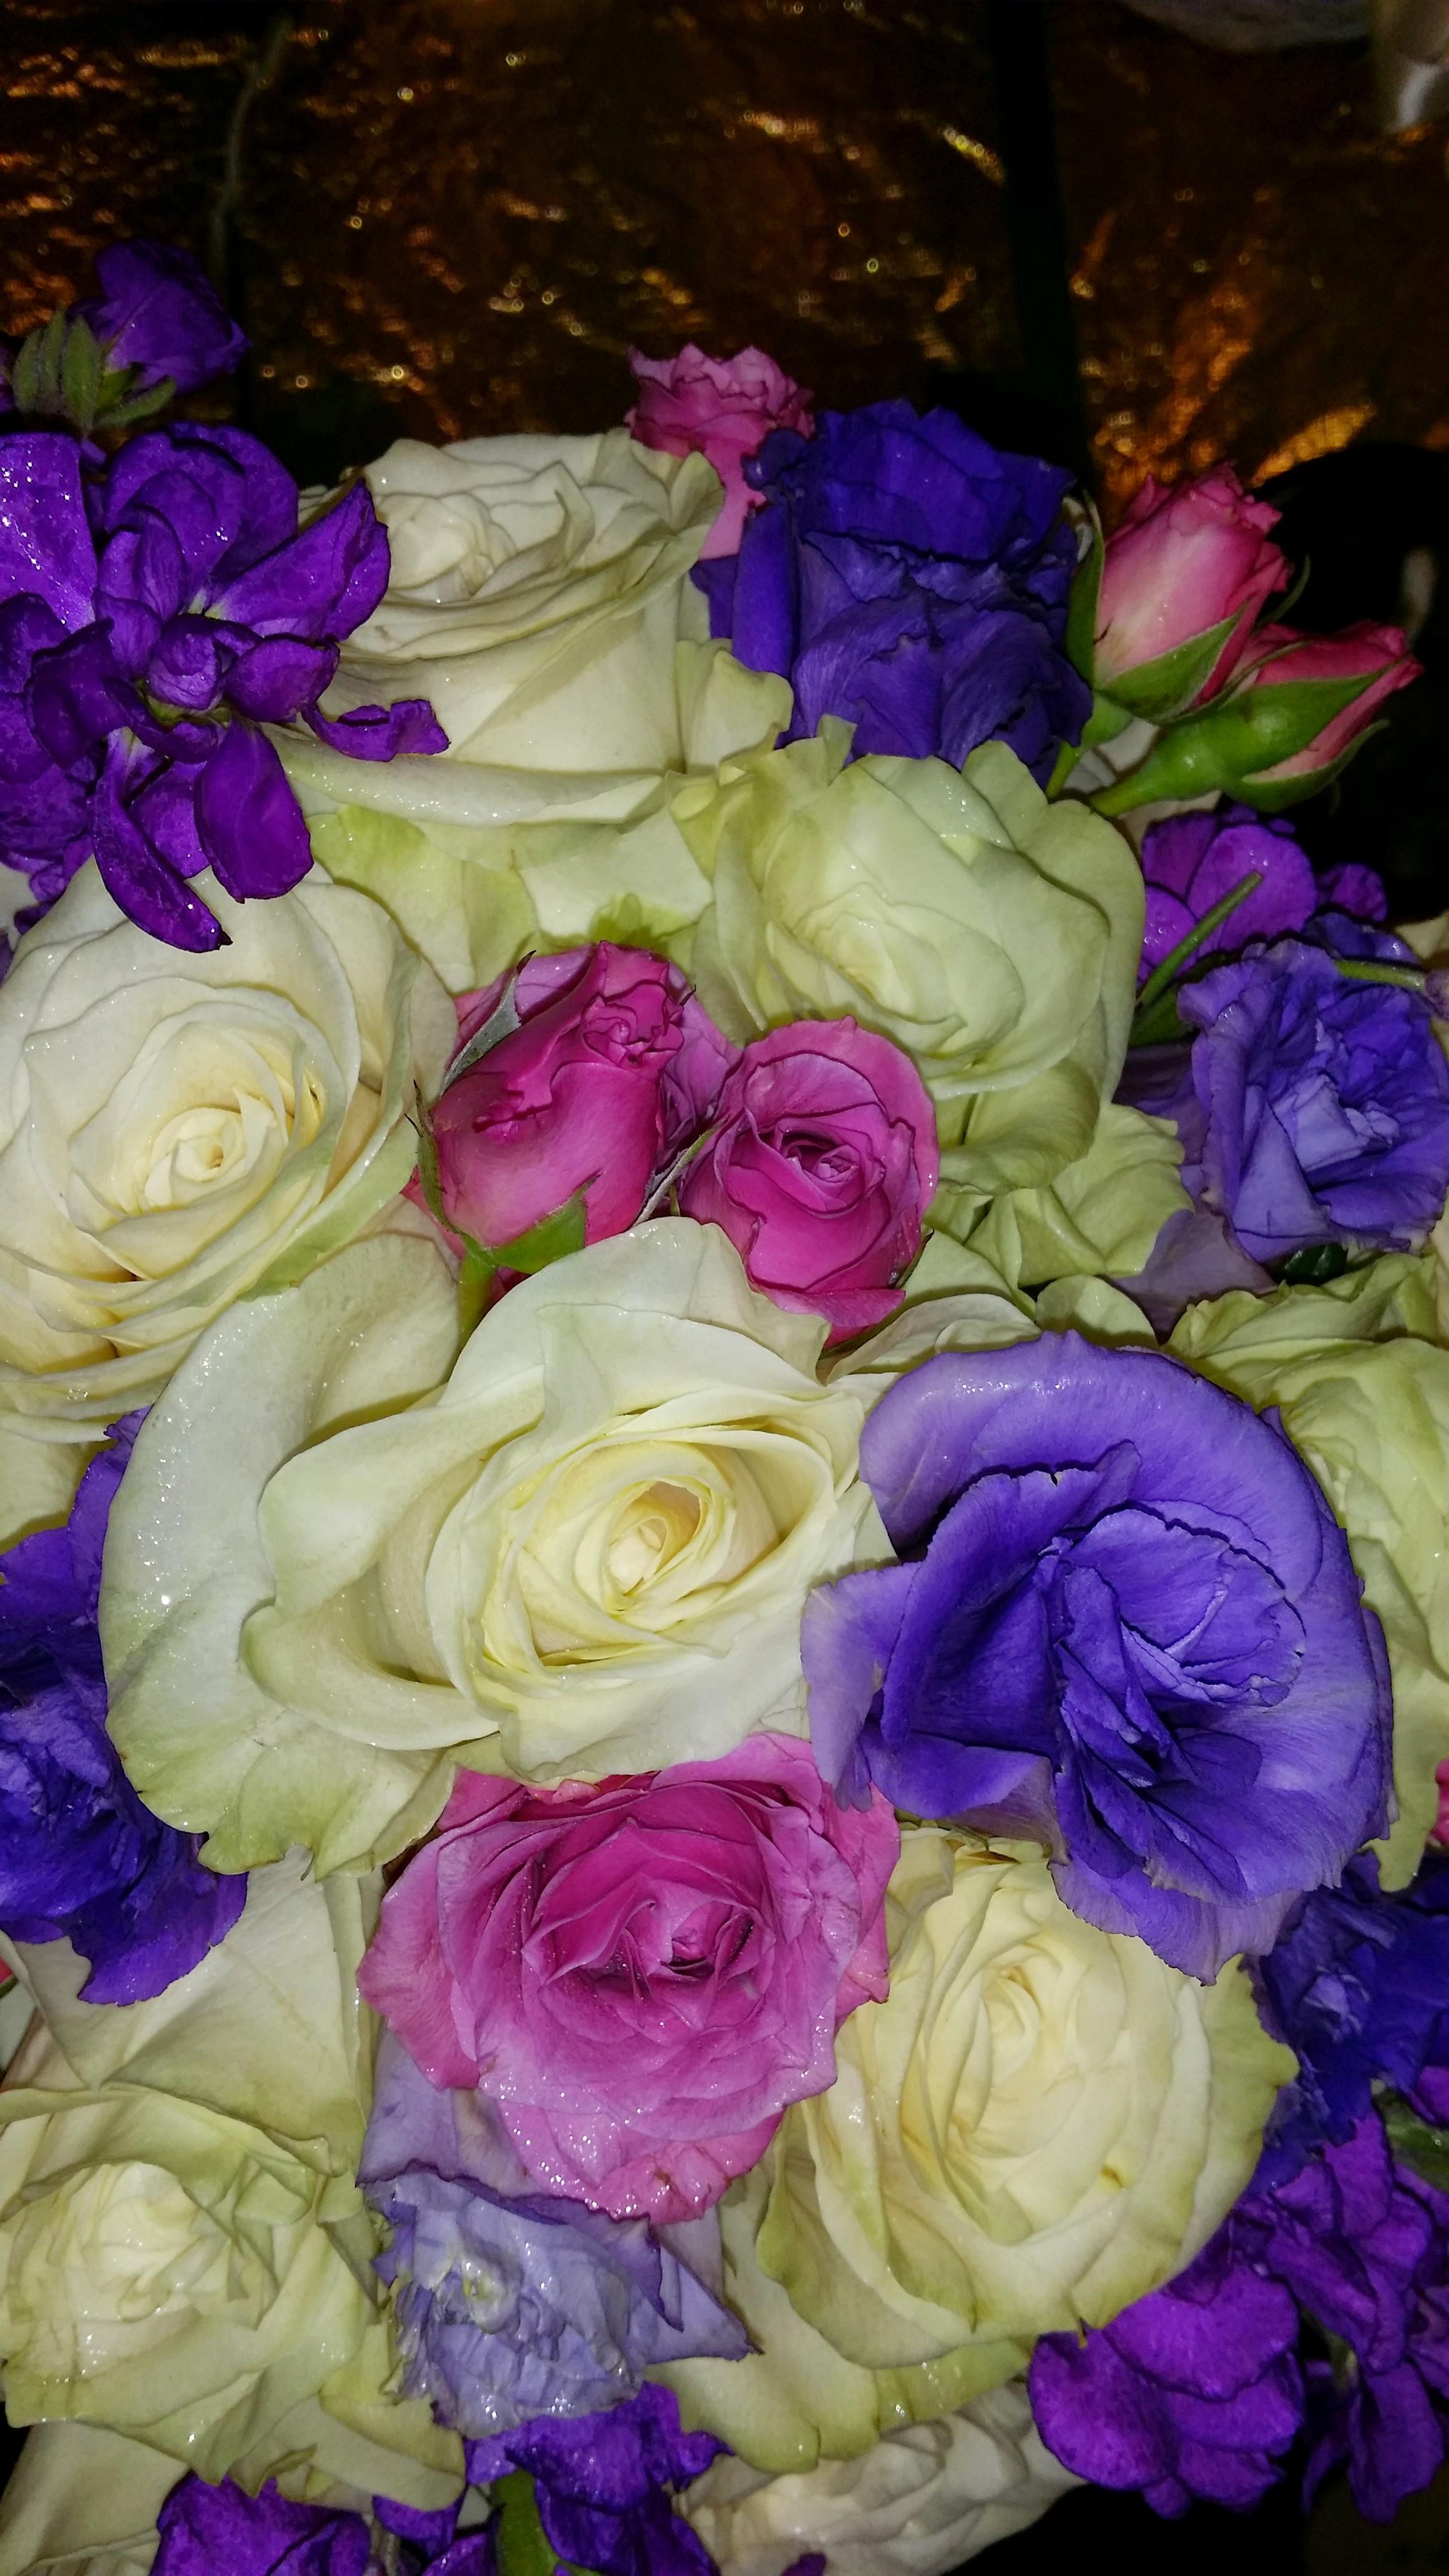 Roses, Lisianthus, Stock